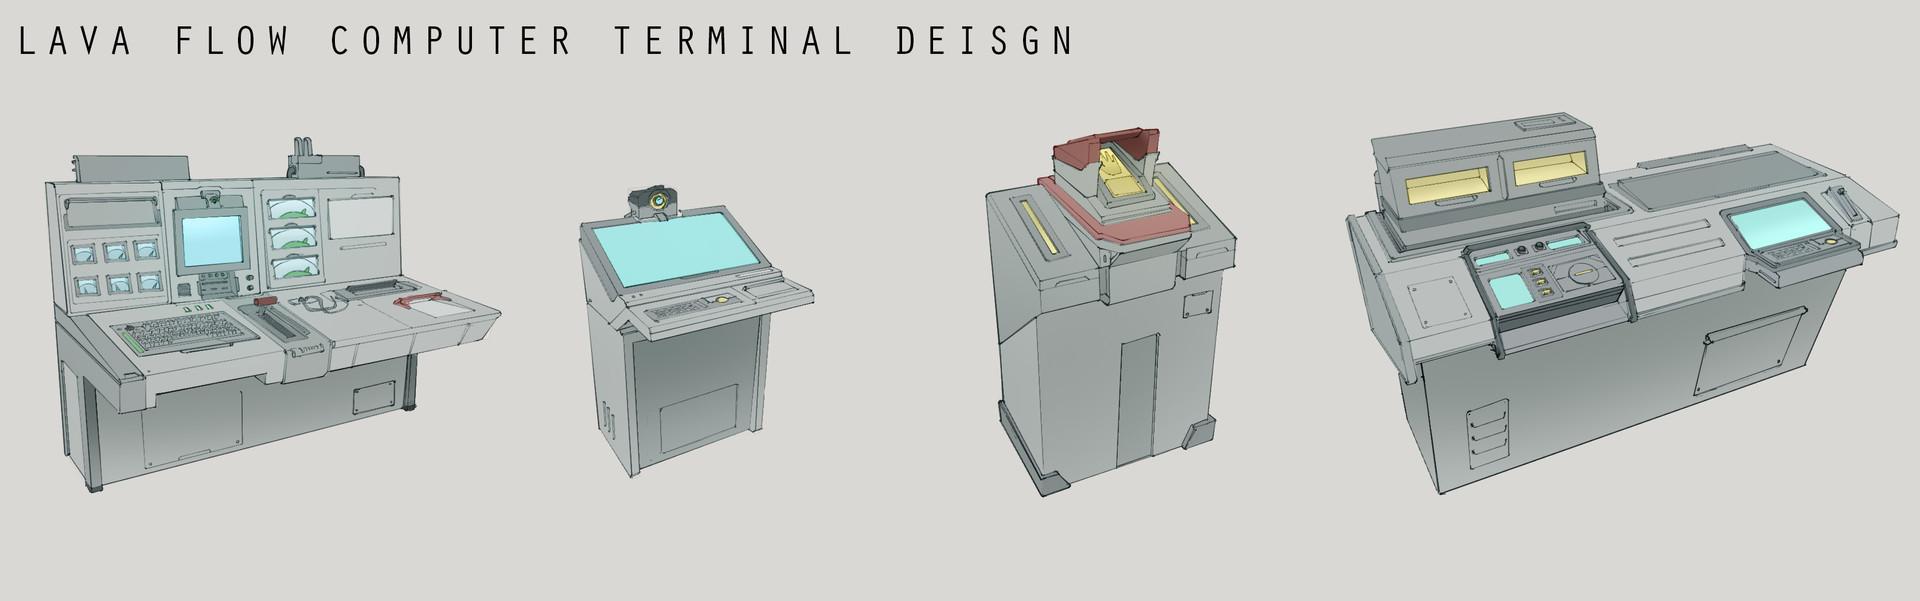 Franklin chan lava flow computer terminal design layout